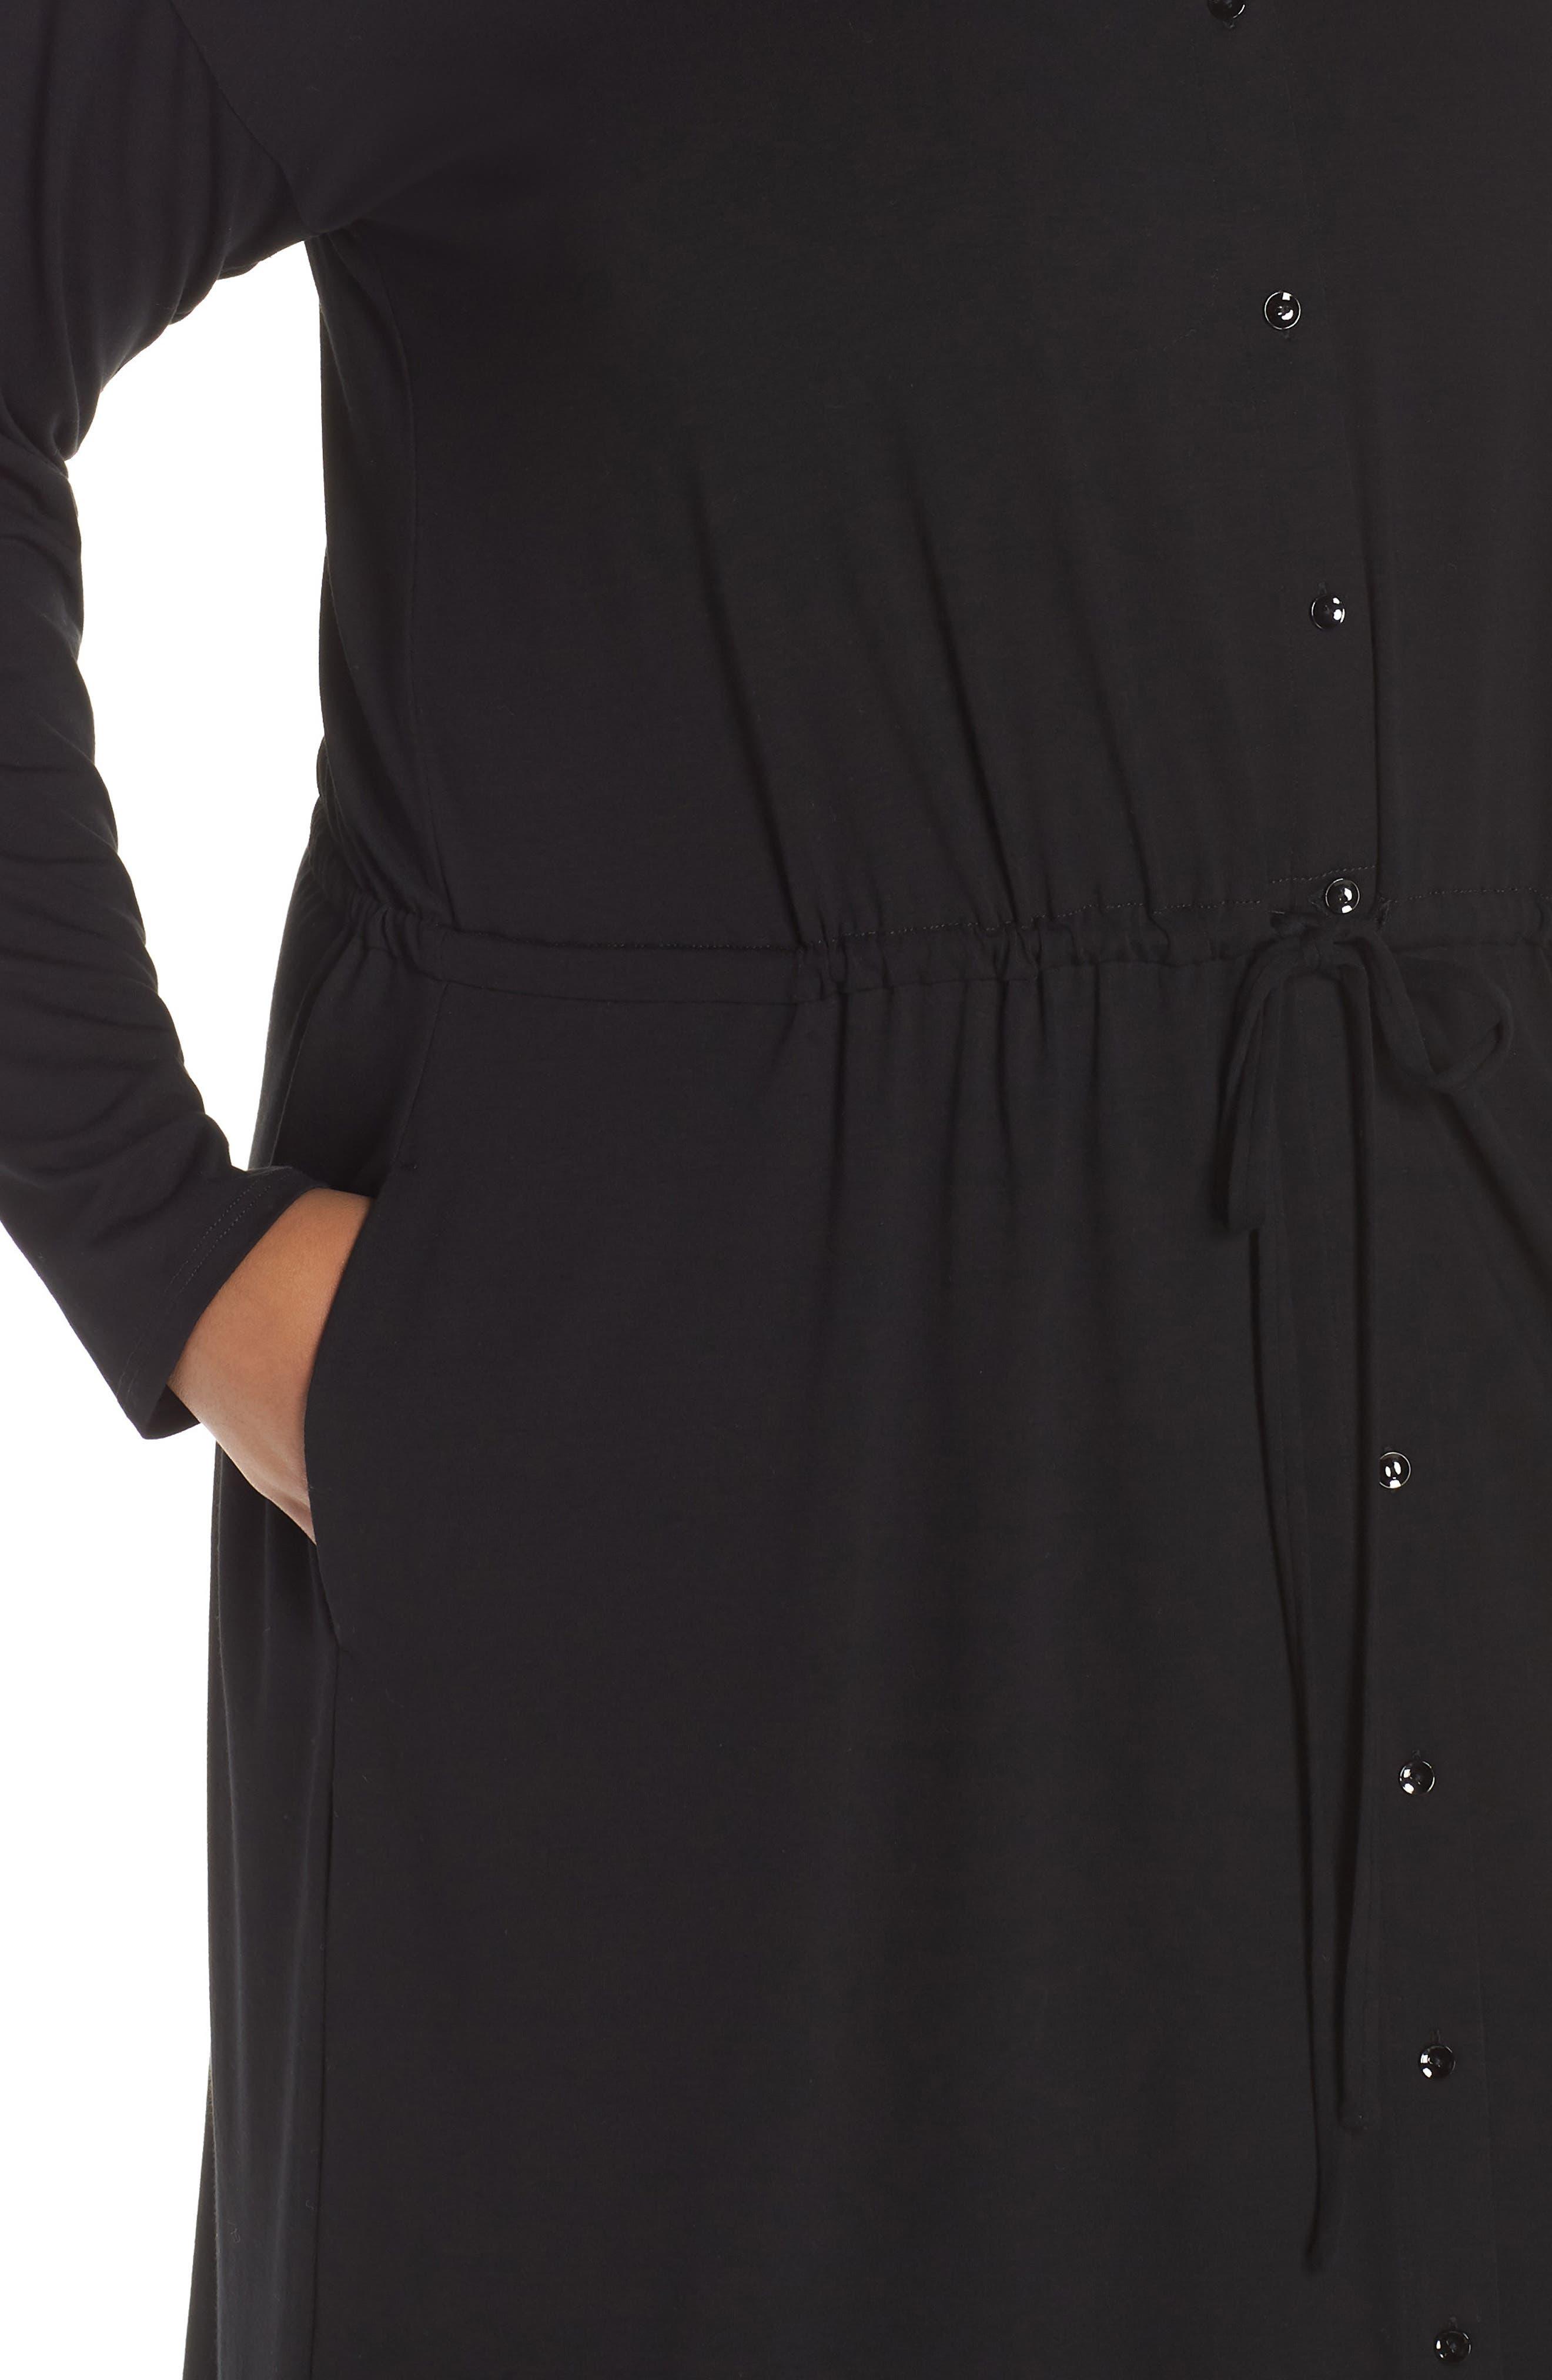 Drawstring Waist Dress,                             Alternate thumbnail 9, color,                             BLACK